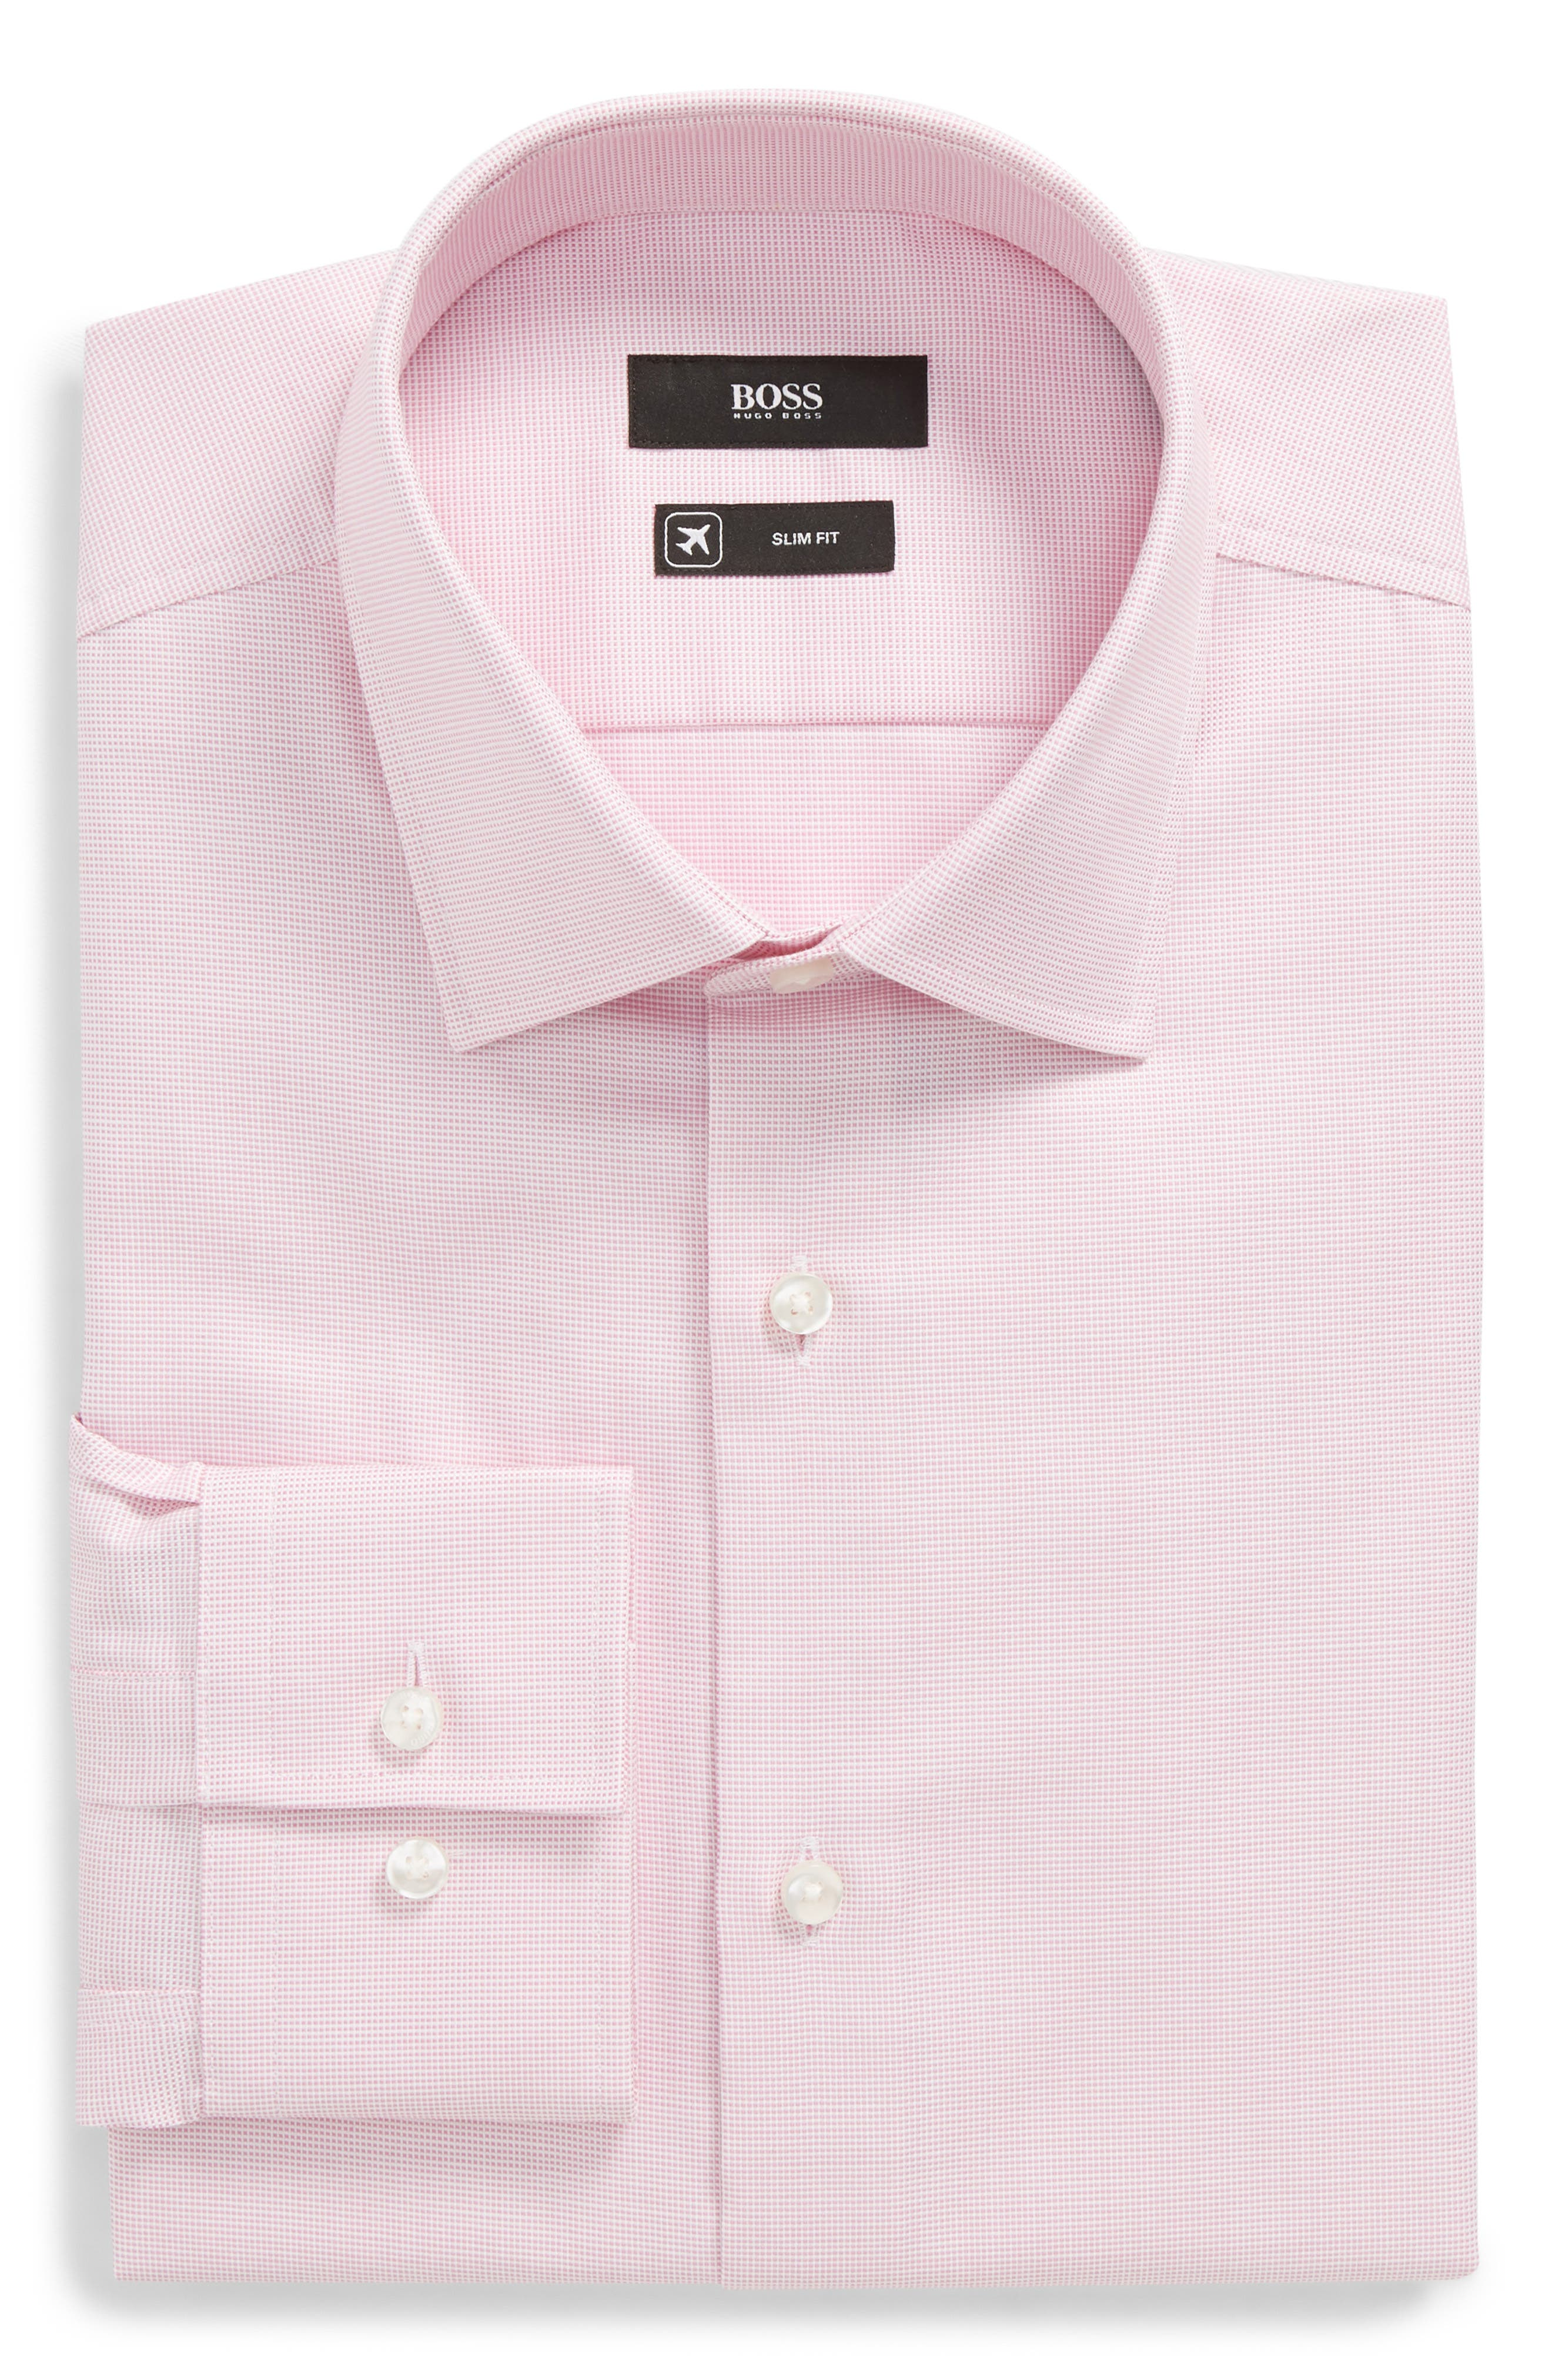 BOSS Jenno Slim Fit Solid Dress Shirt